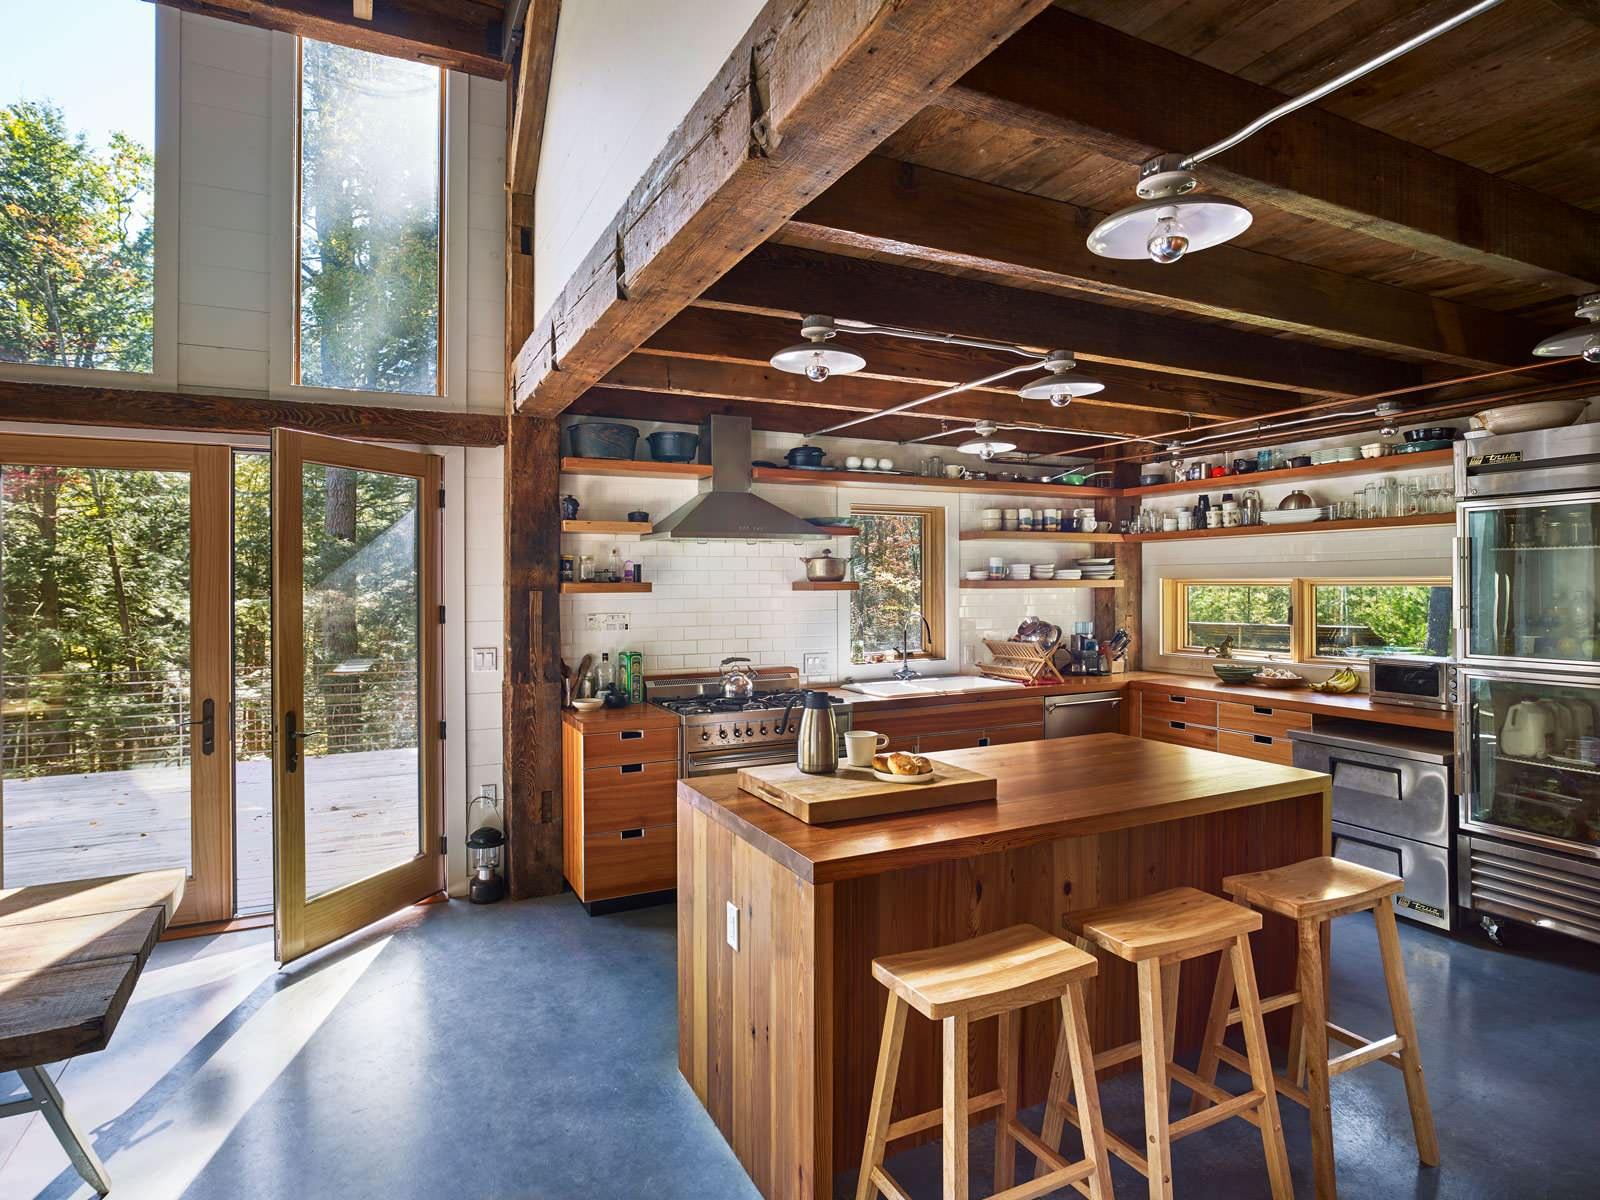 inspiring kitchen design ideas org | 15 Inspirational Rustic Kitchen Designs You Will Adore